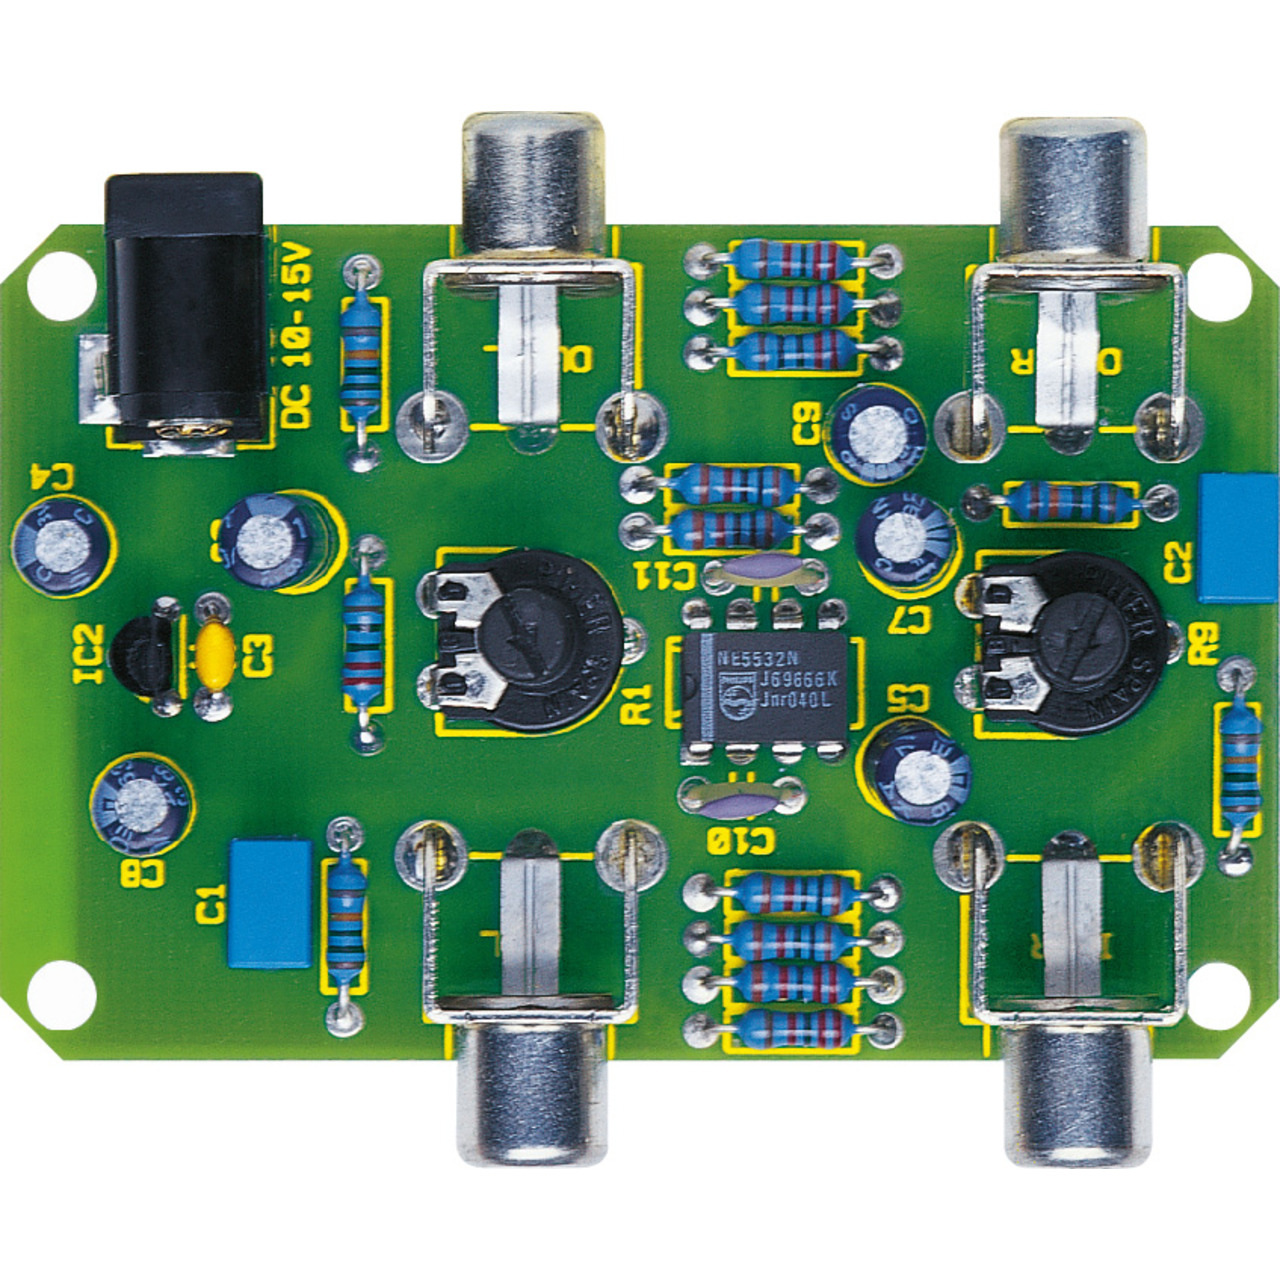 ELV Komplettbausatz Aufhol-Verstärker AHV 100- ohne Gehäuse